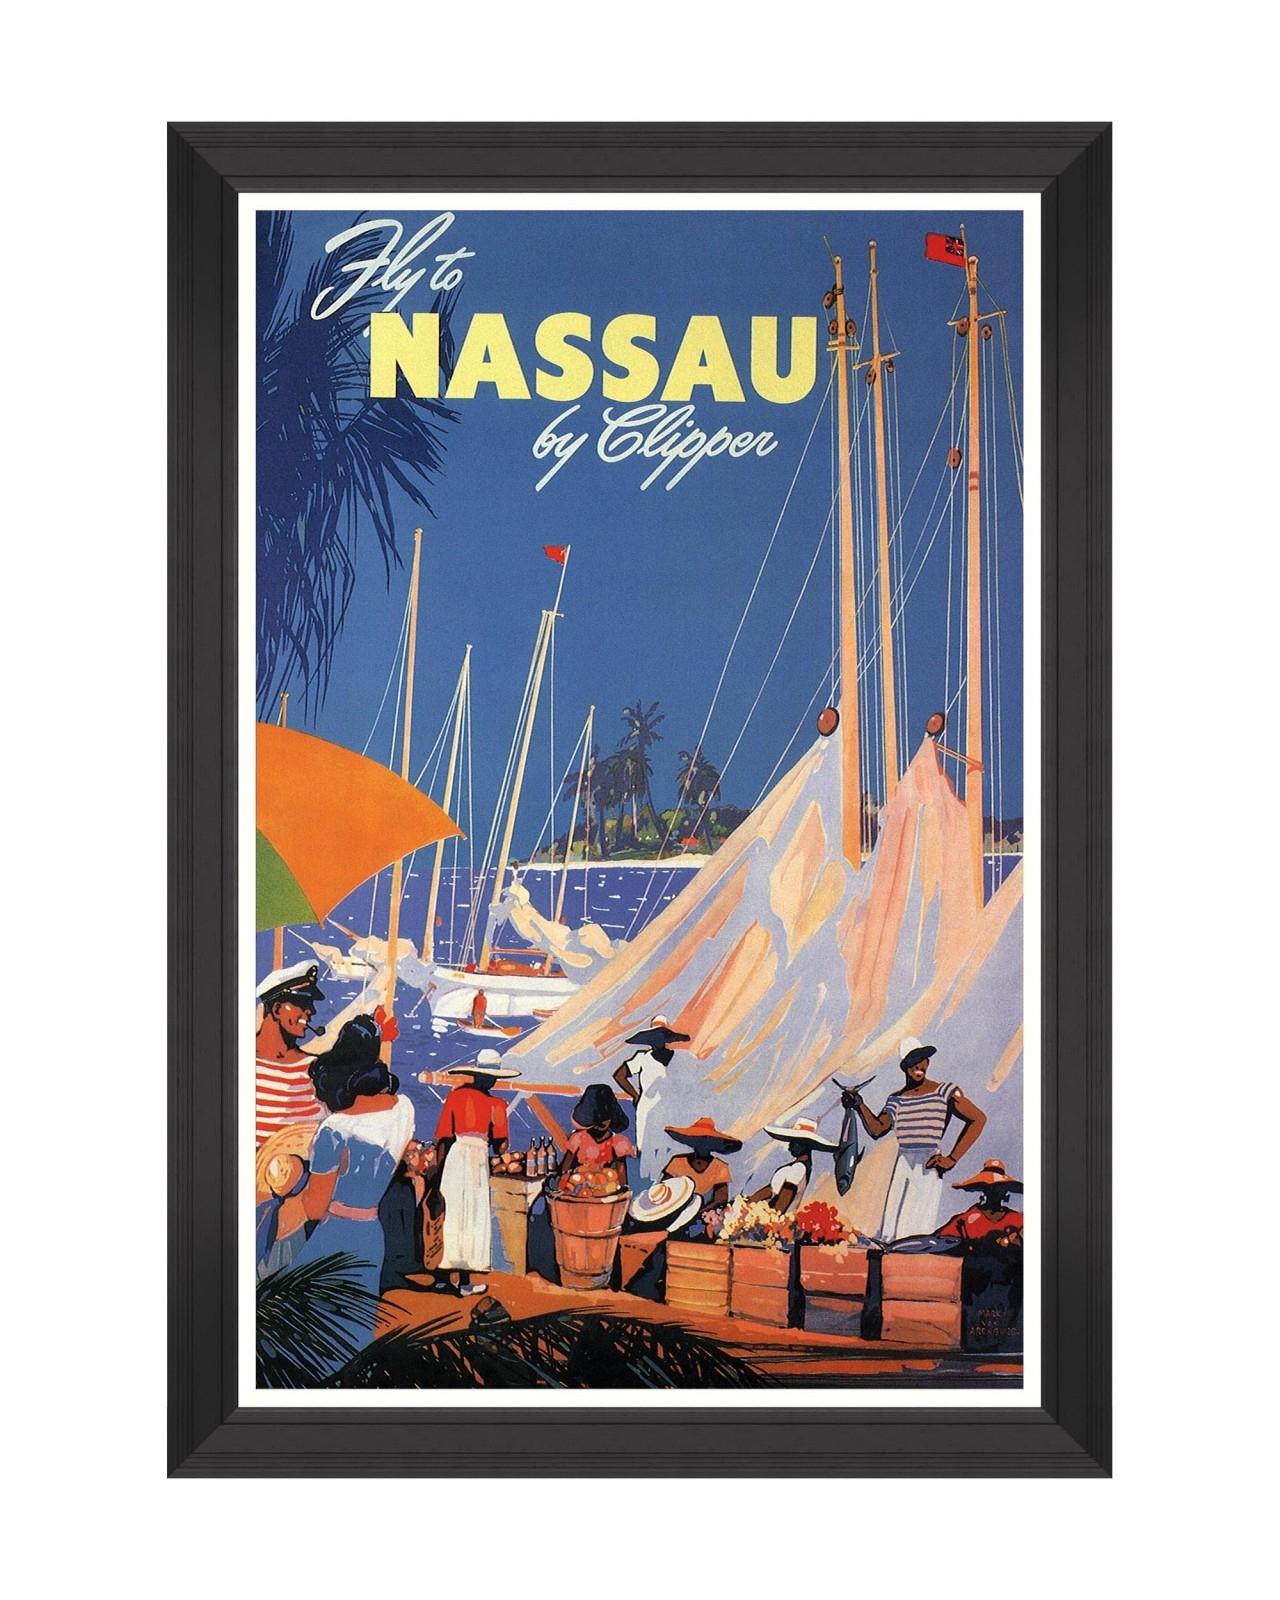 Tablou Framed Art Caribbean Travels - Fly To Nassau, 60 x 90 cm imagine